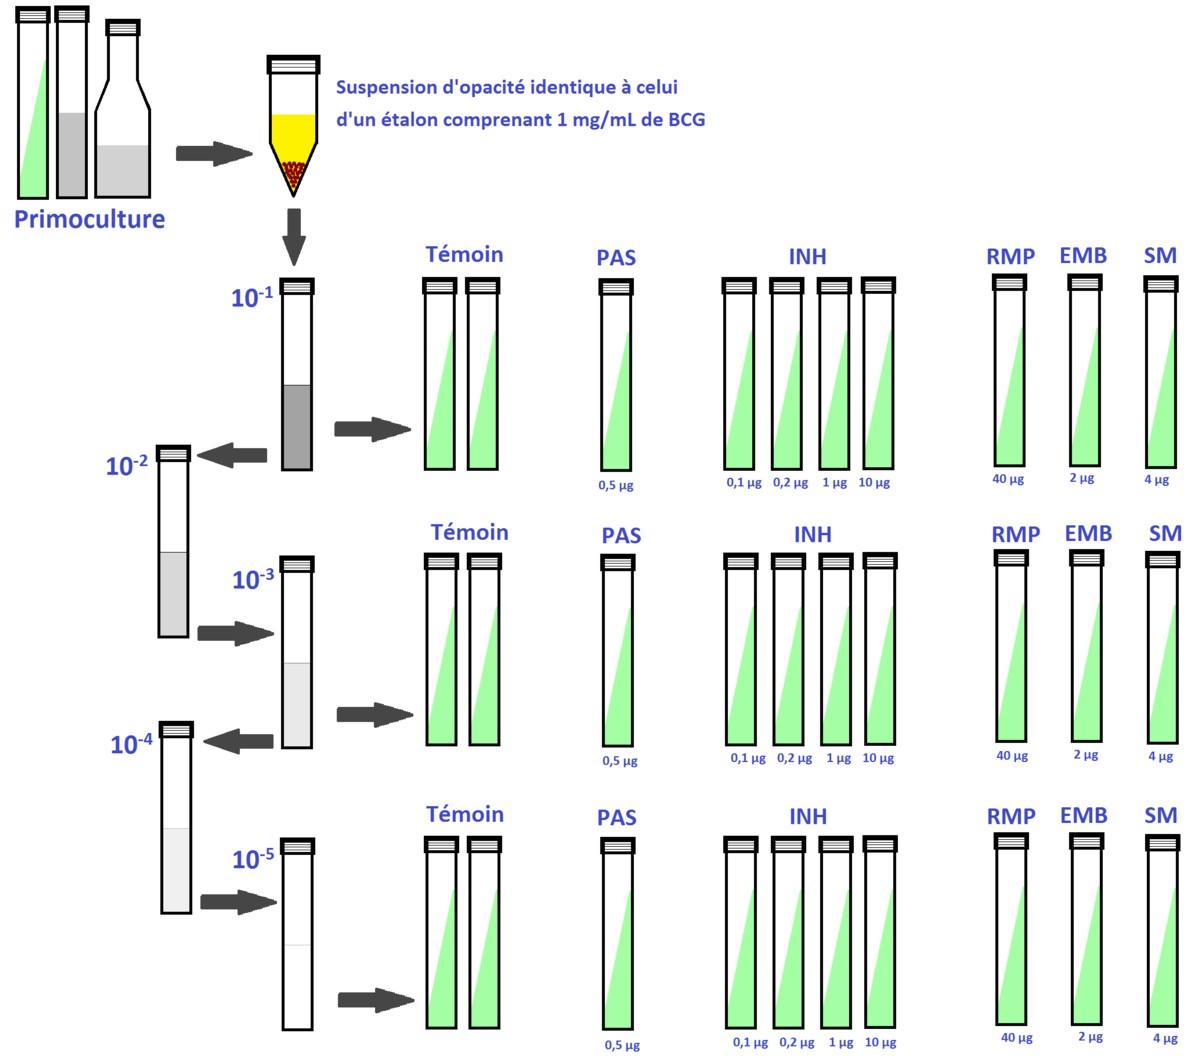 antibiogramme des mycobactéries